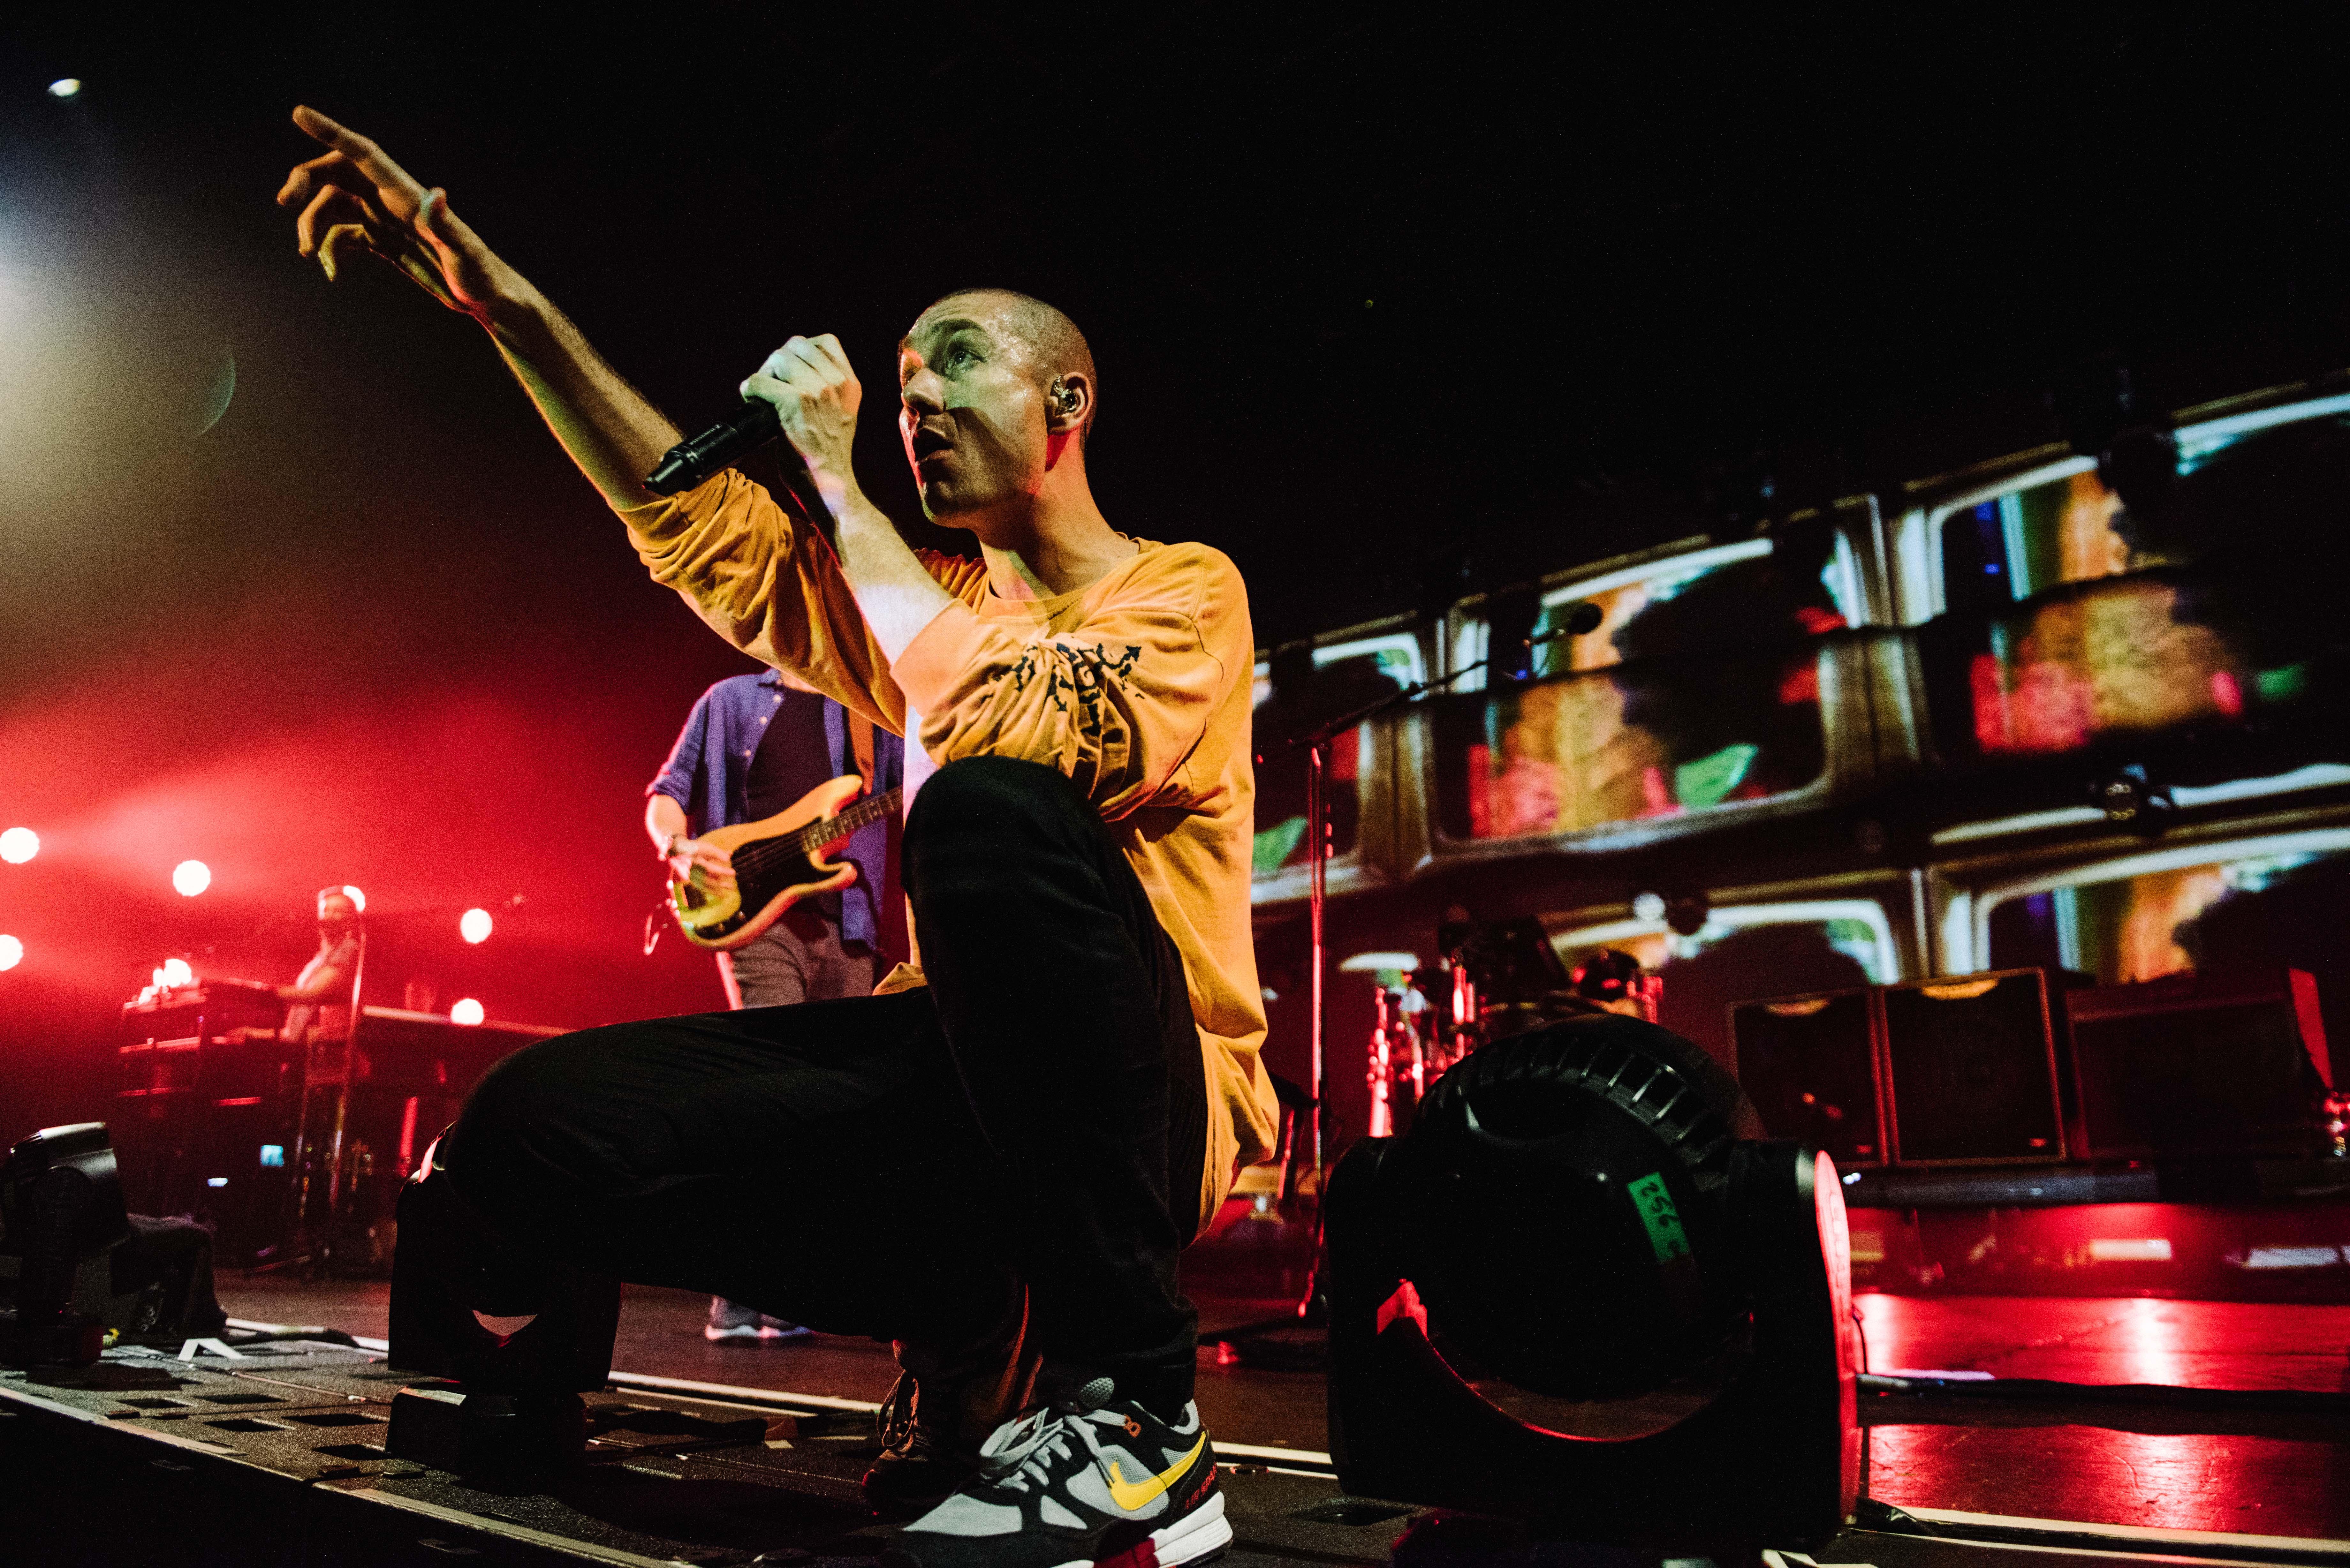 Bastille Dan Smith live Manchester Feb 2019